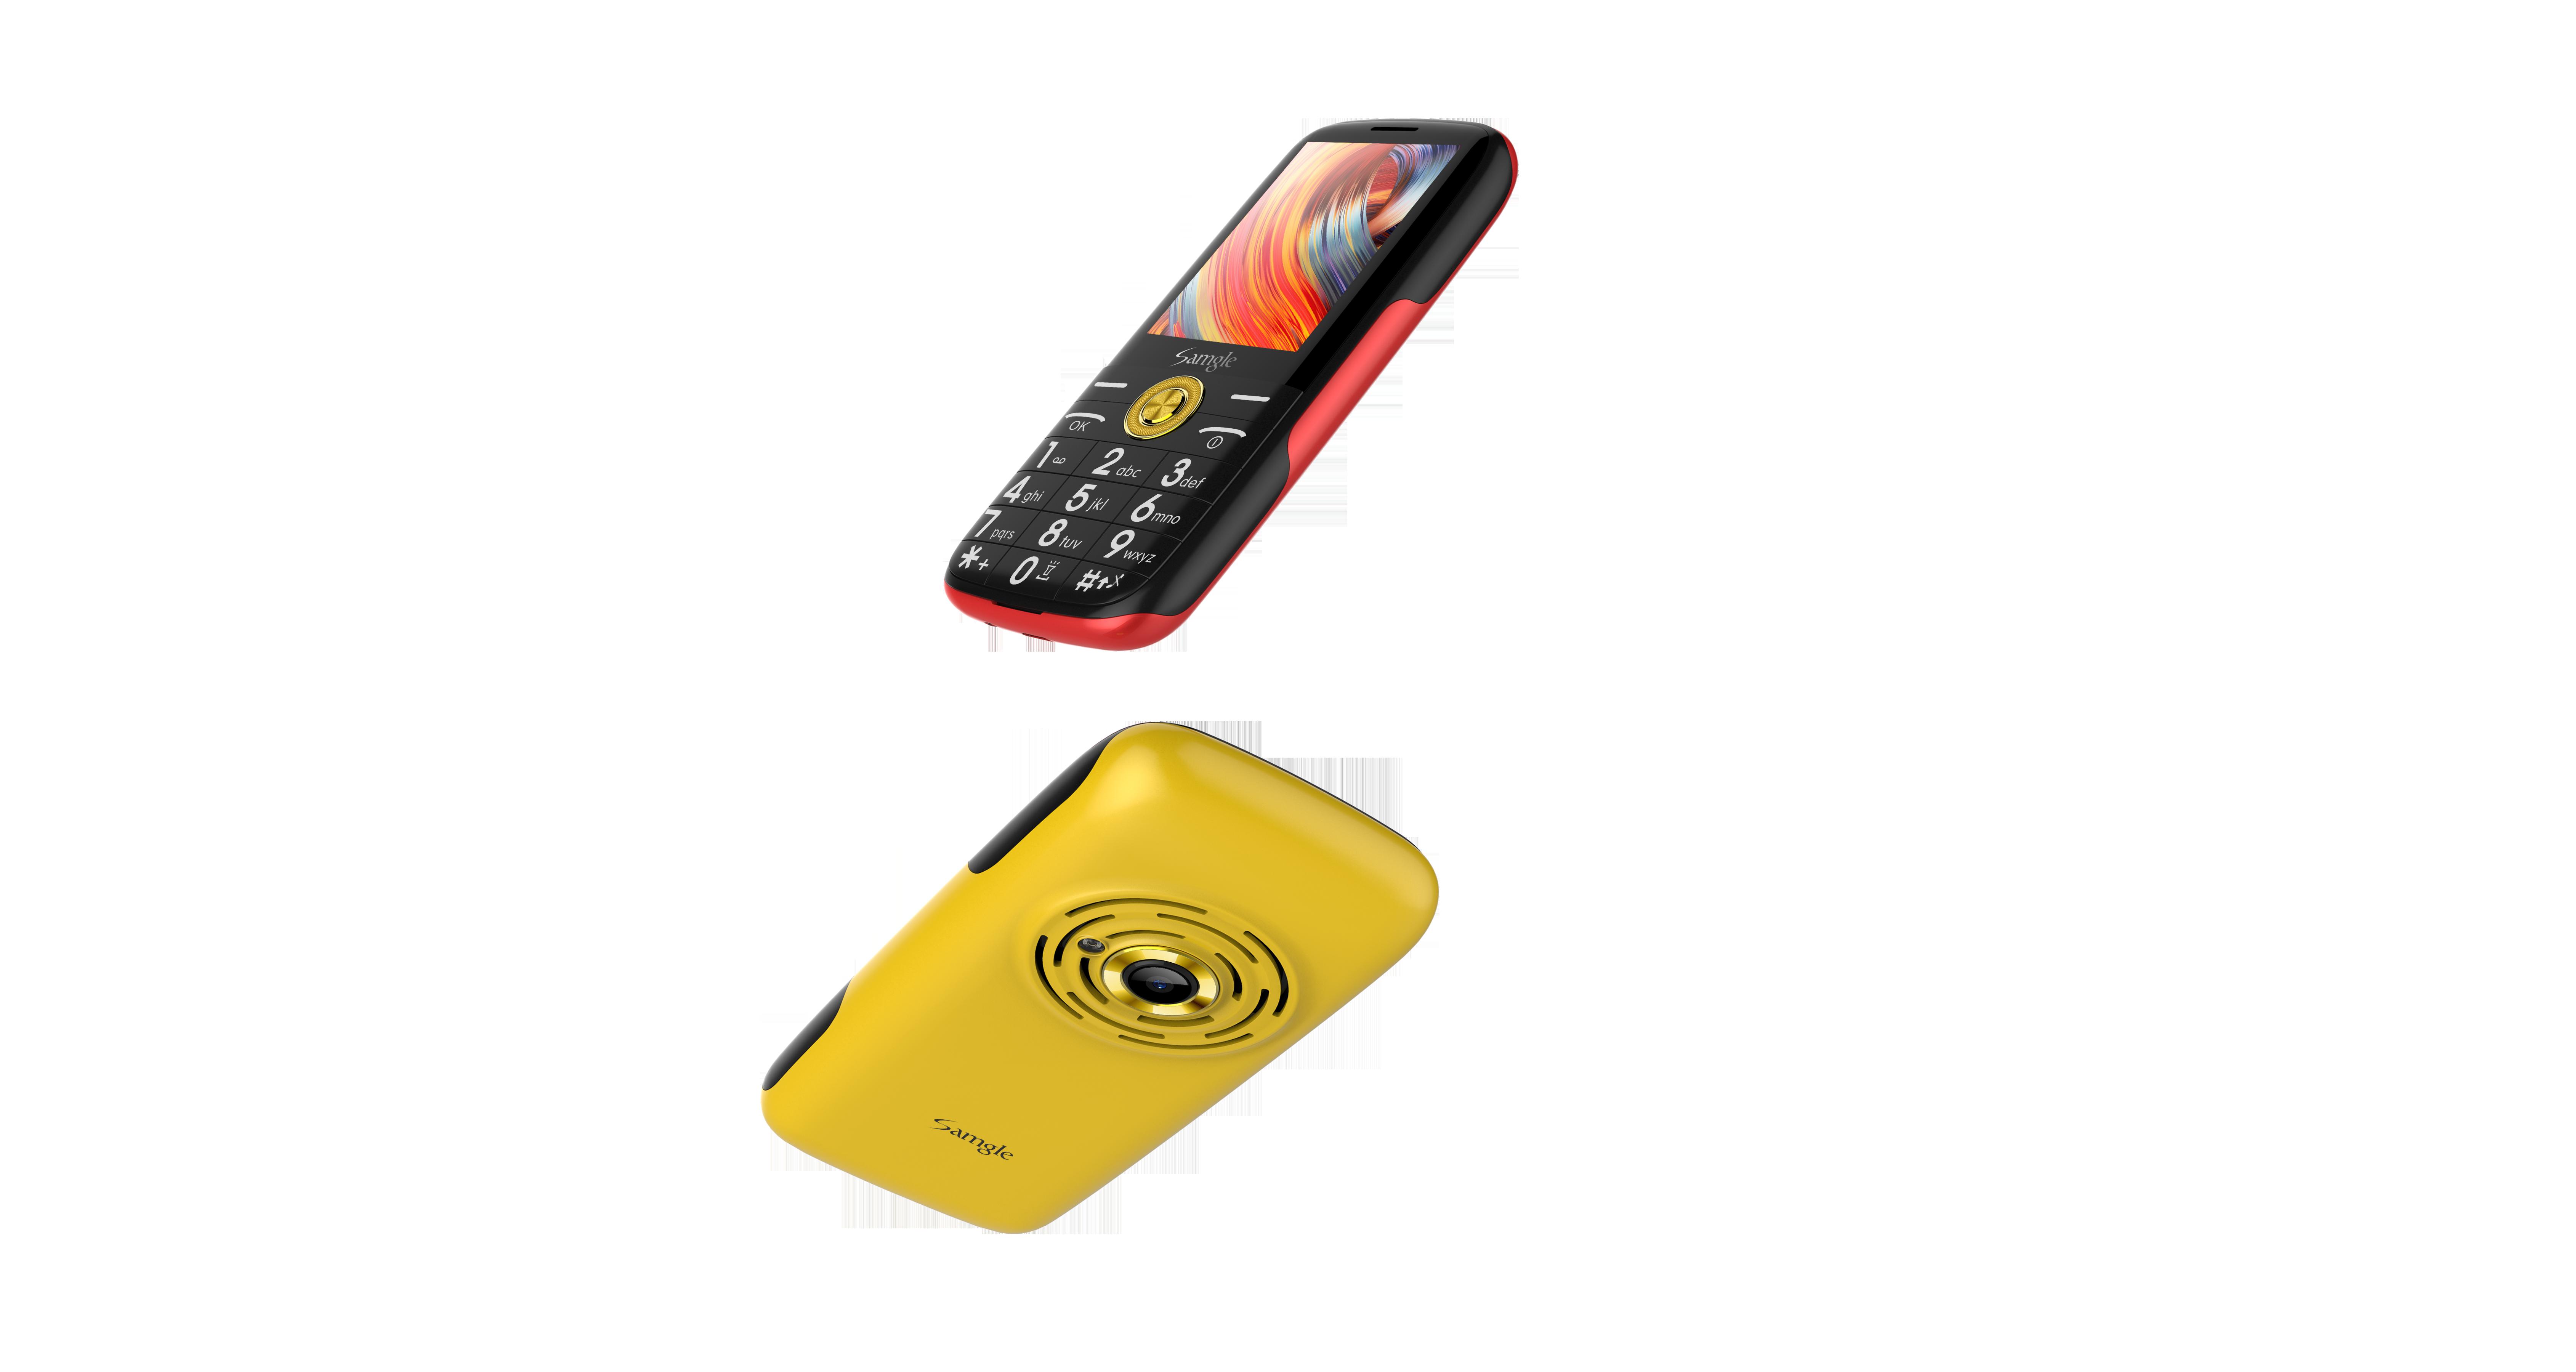 Telefon mobil Samgle Captain 3G, QVGA 2.4 inch, Bluetooth, Digi 3G, Camera, Slot Card, Radio FM, Internet, Dual SIM18